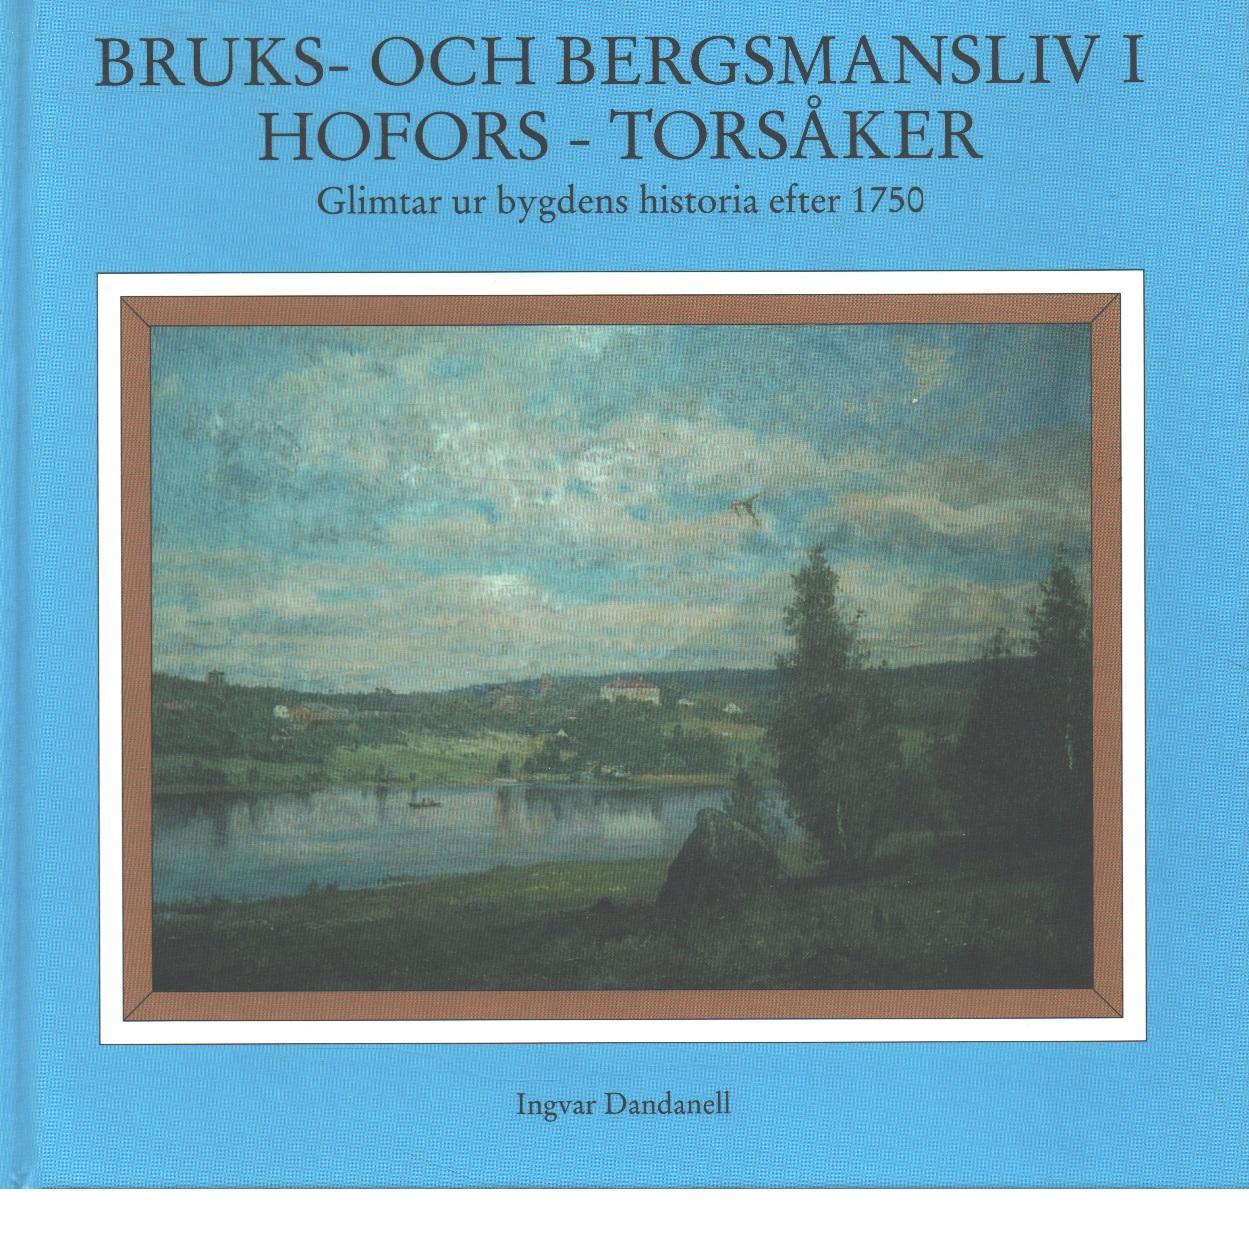 Bruks- och bergsmansliv i Hofors - Torsåker : glimtar ur bygdens historia efter 1750 - Dandanell, Ingvar